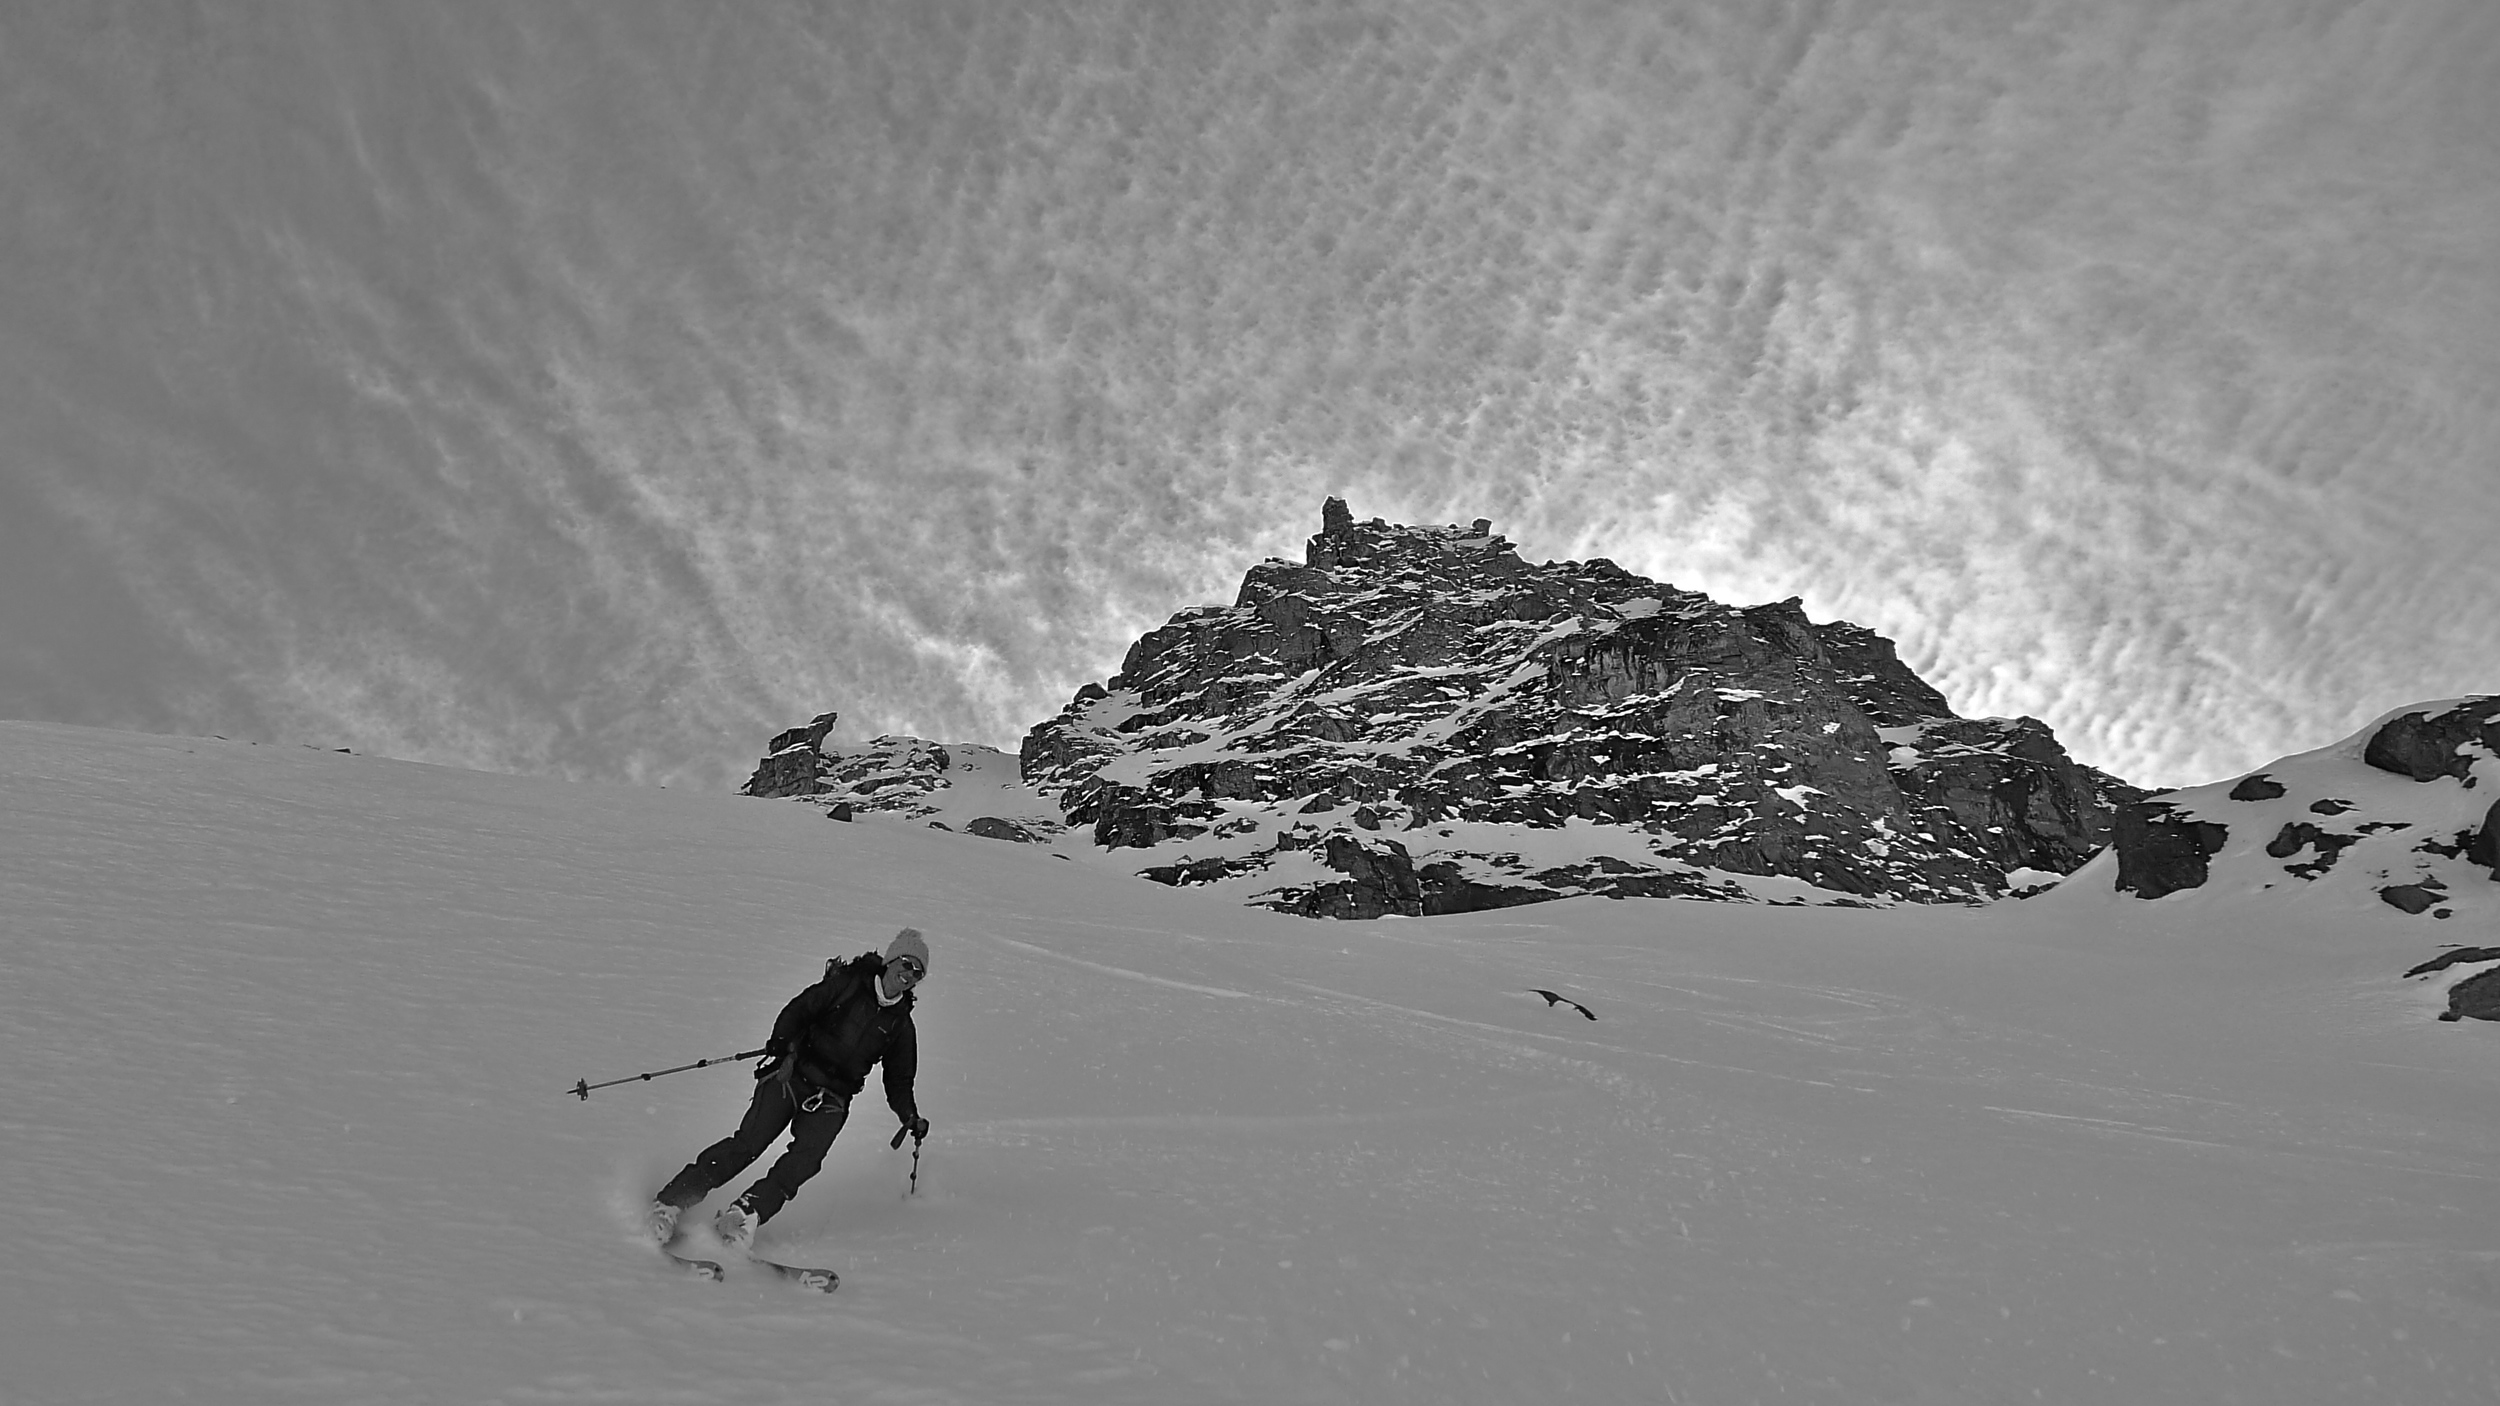 Day 3: Cold snow above Prafleuri